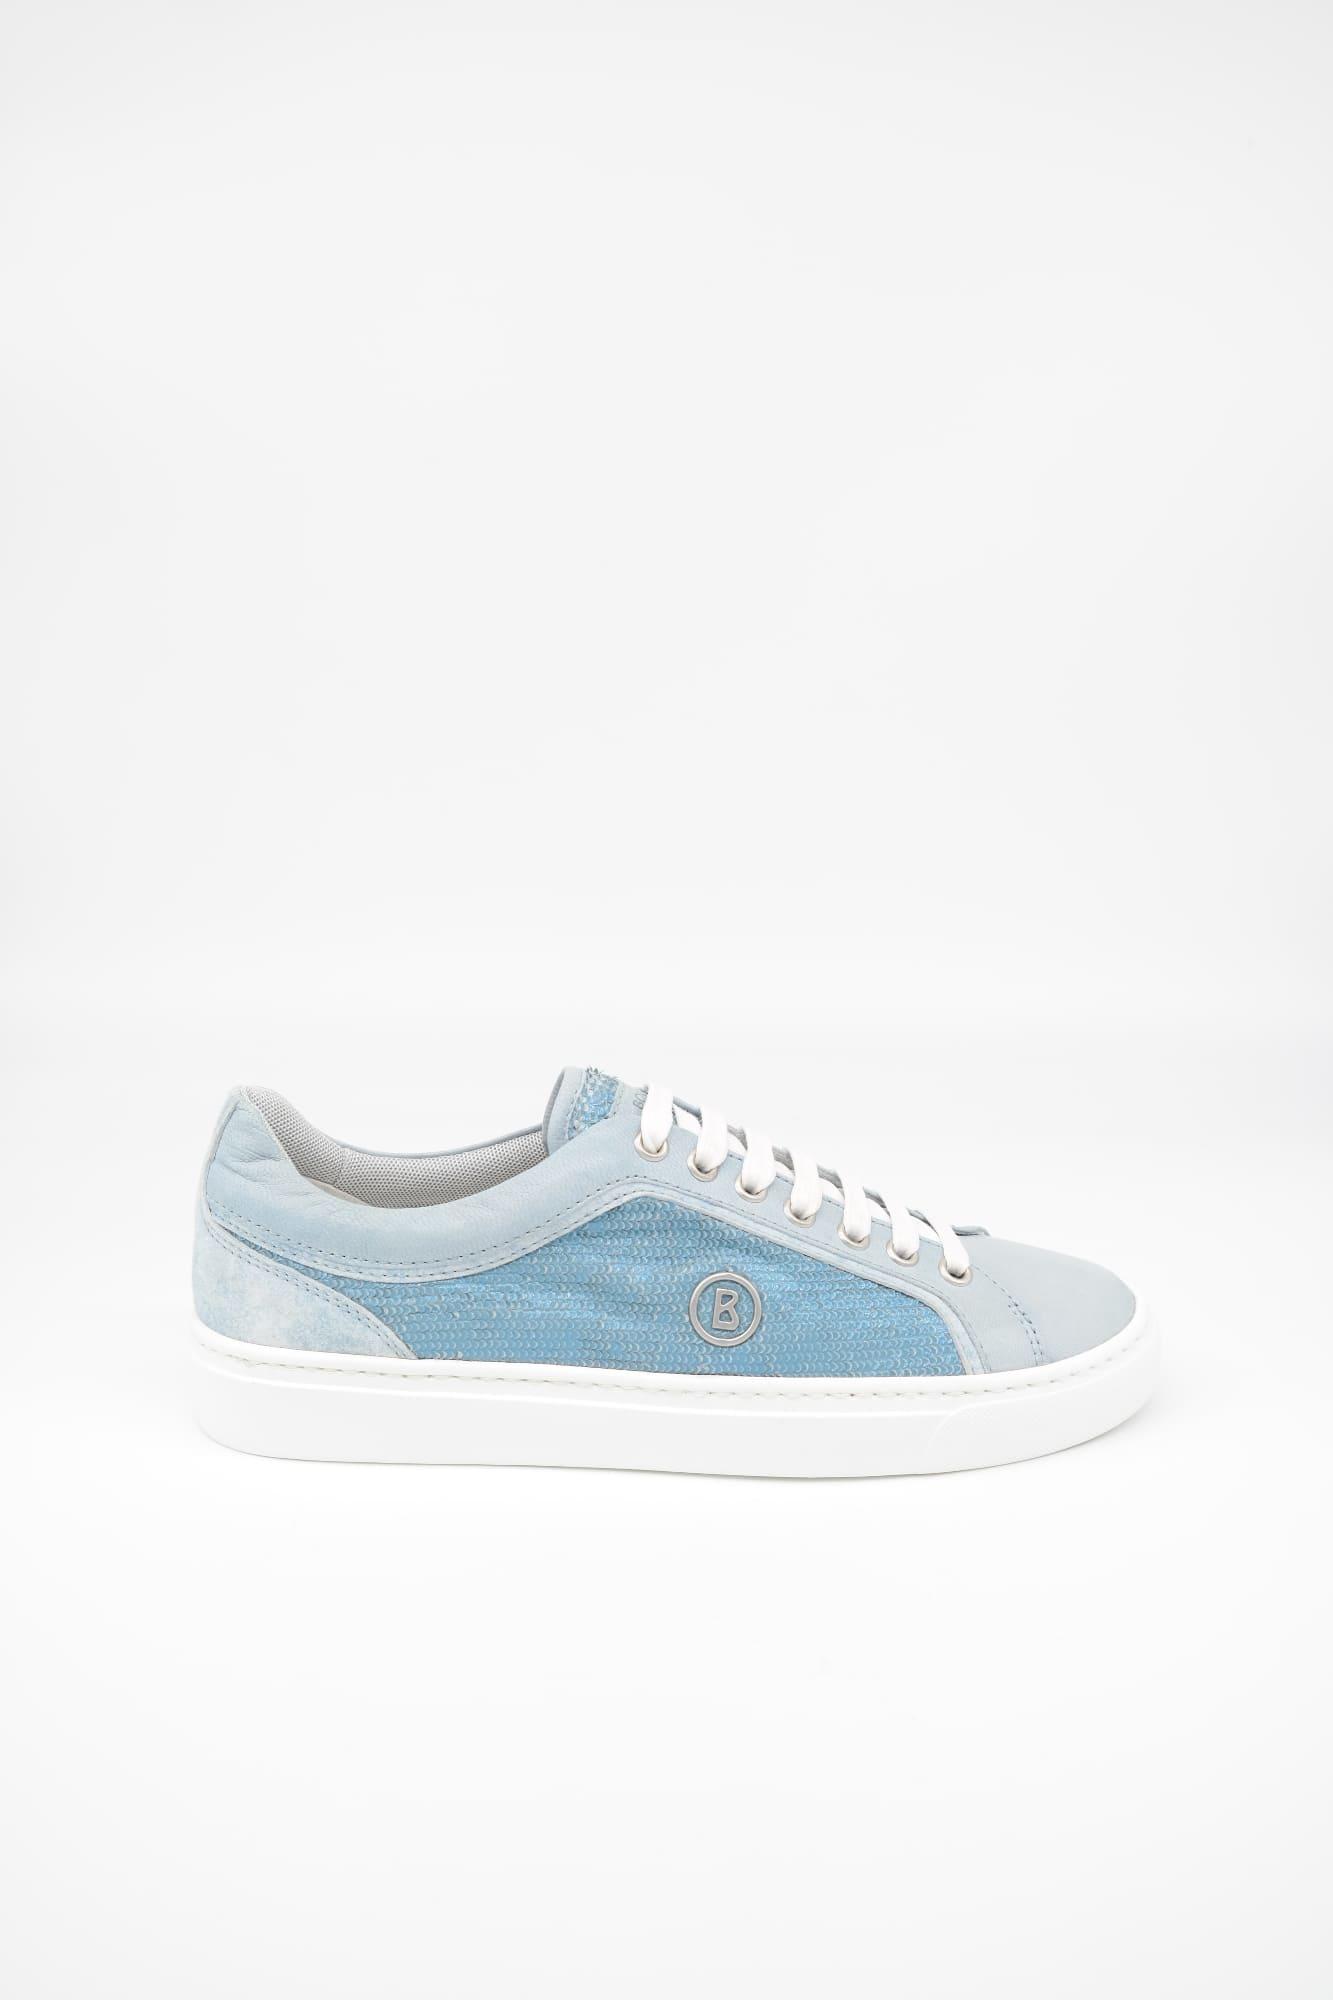 BOGNER Damen New Salzburg 21 Sneaker, Schuhe, Size: 37 EU / Leder / SKY